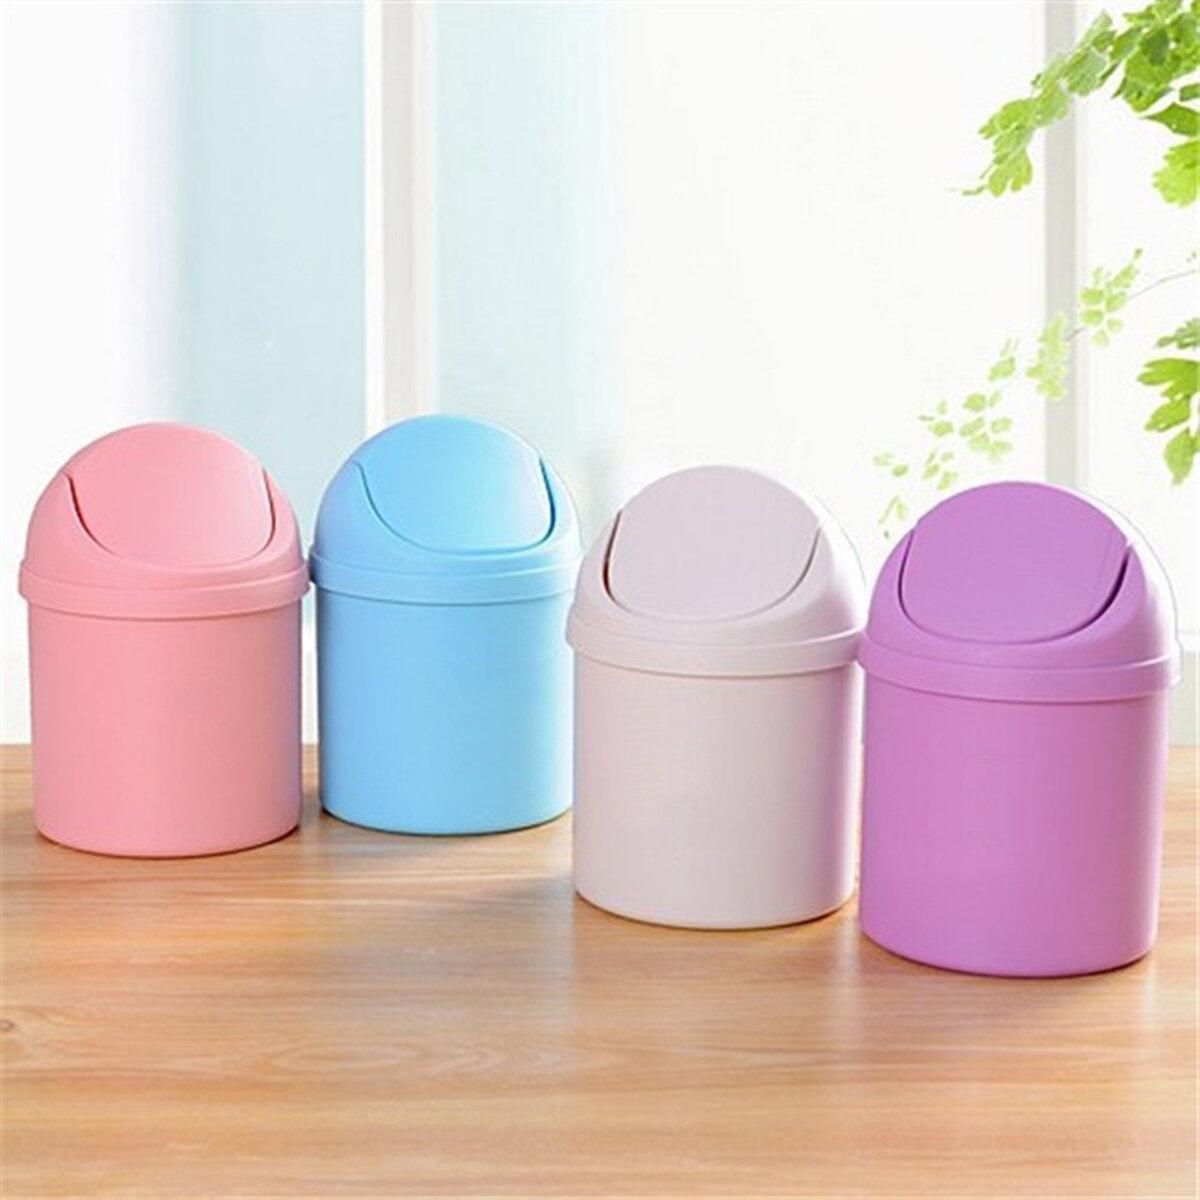 Mini Waste Bin Desktop Garbage Basket Home Table Trash Can Dustbin Container